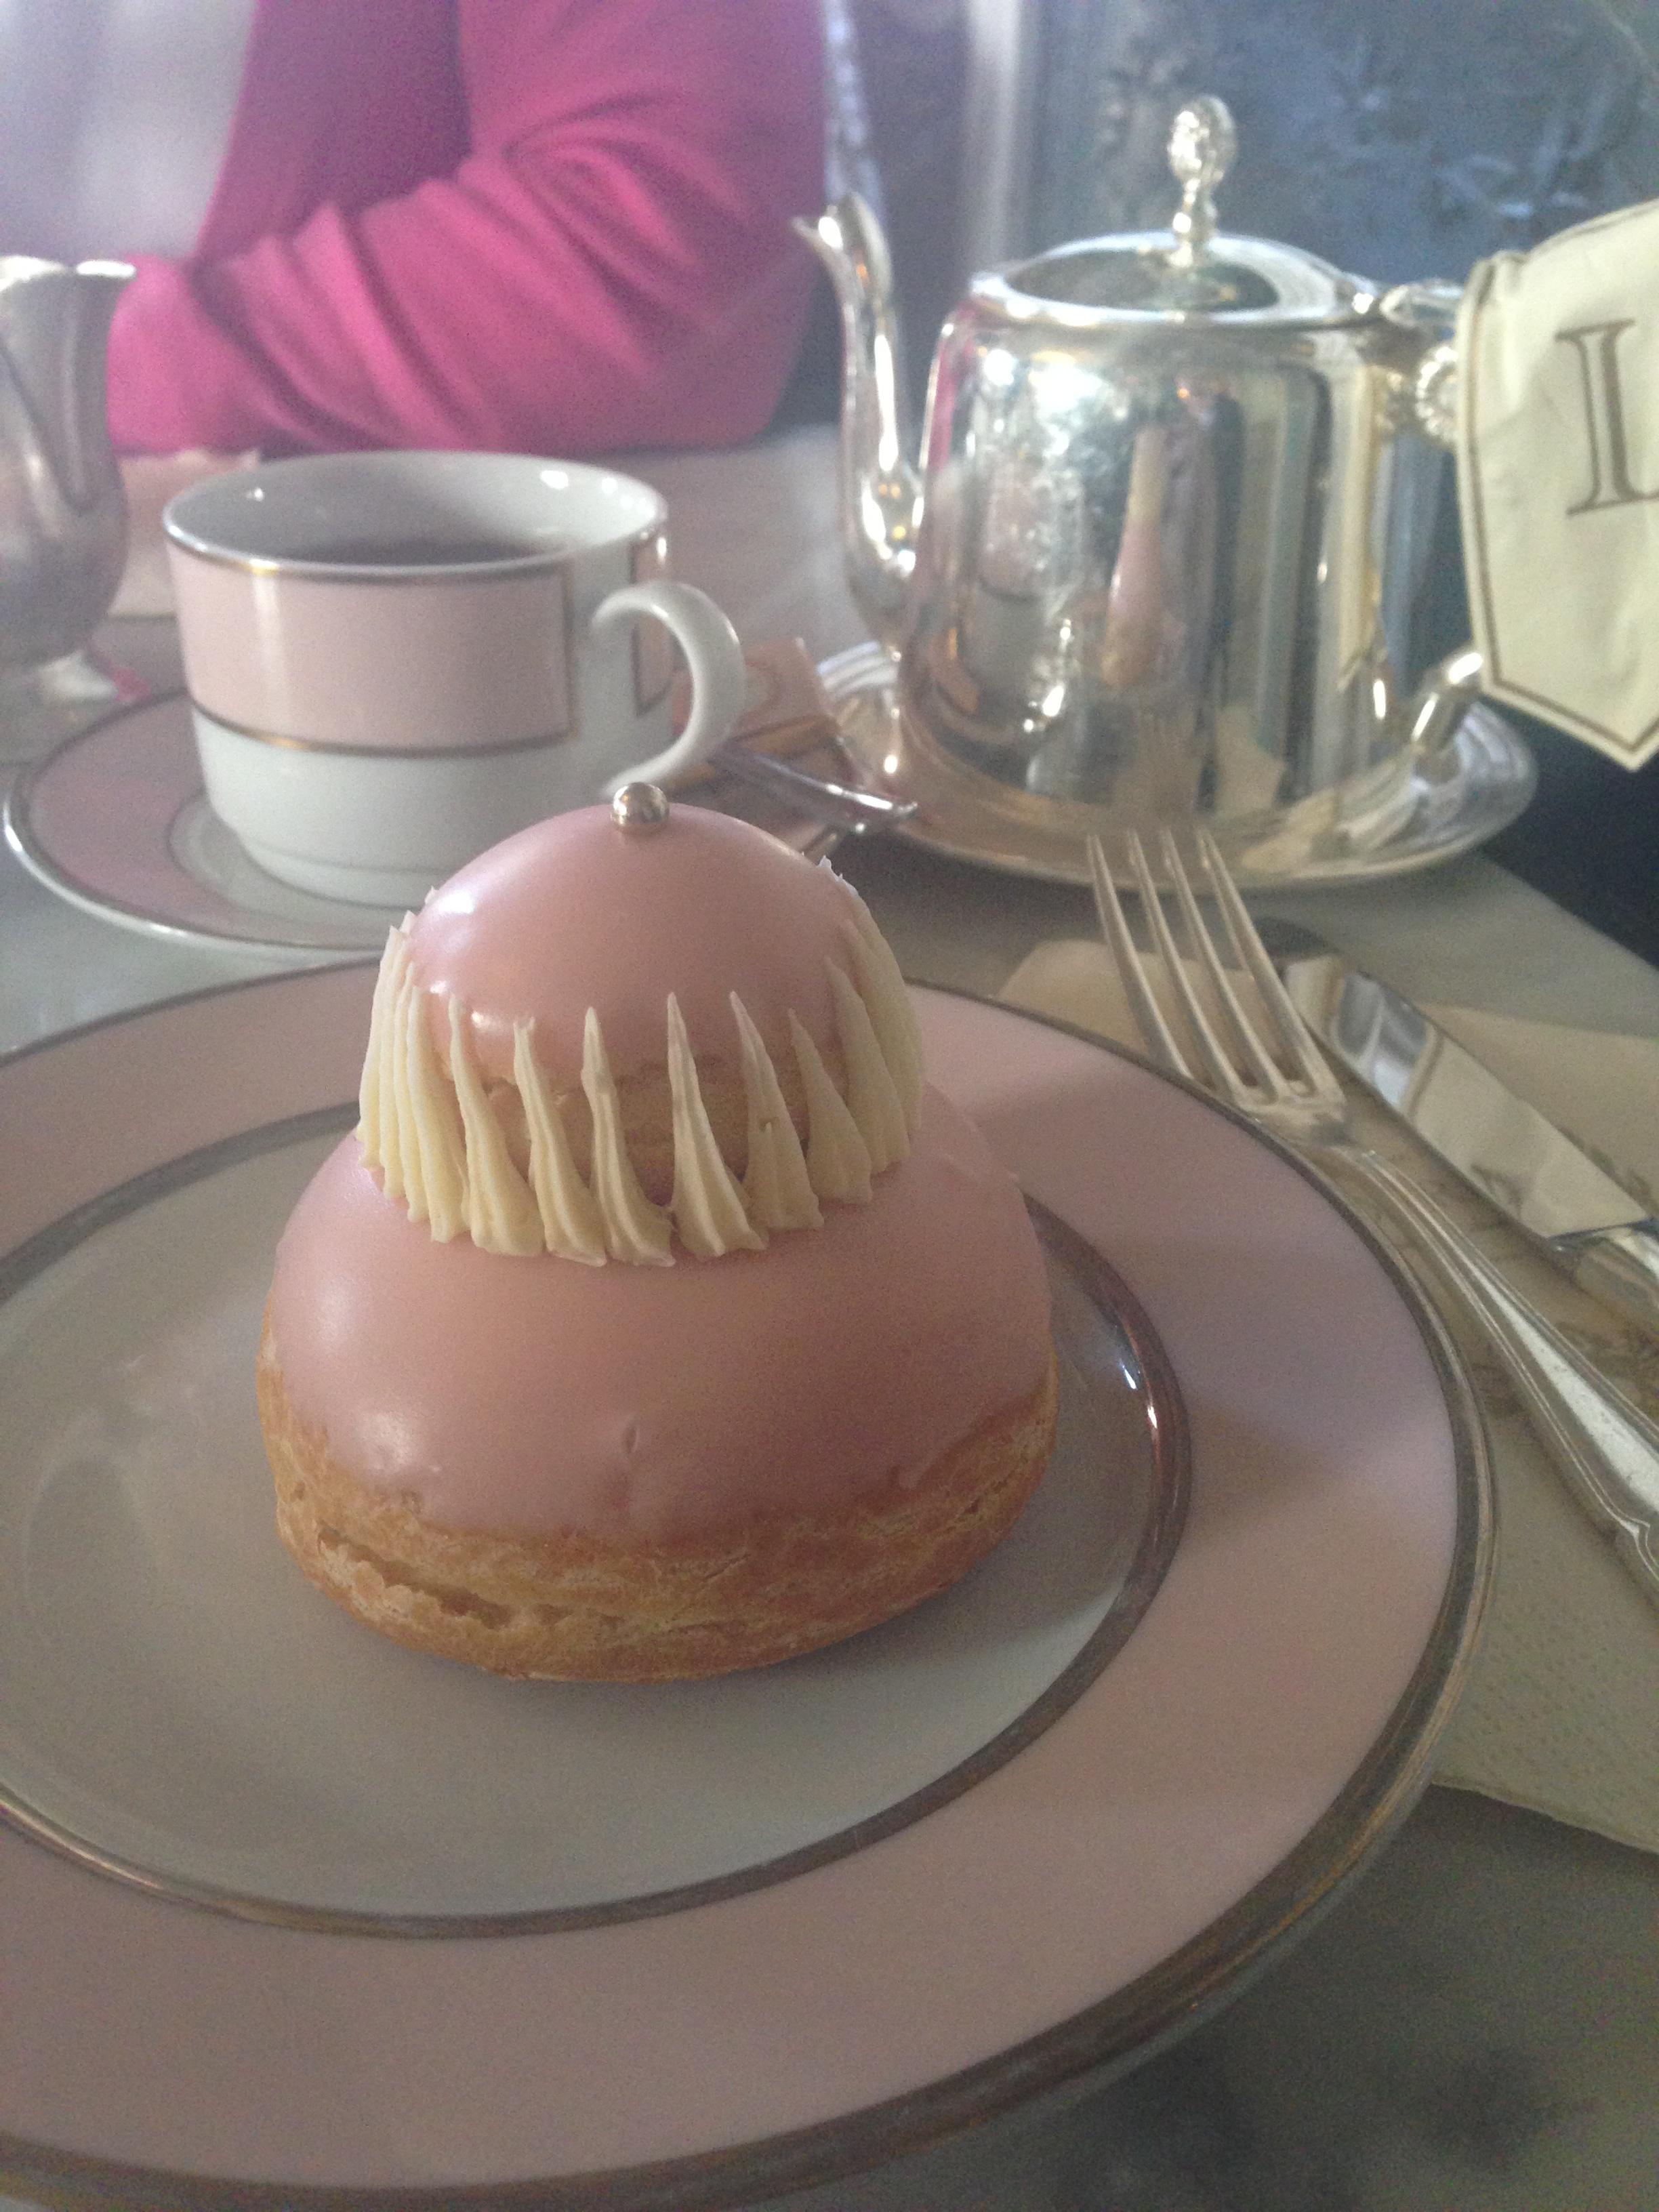 Tea & a Rose Réligieuse at Ladurée, Paris.